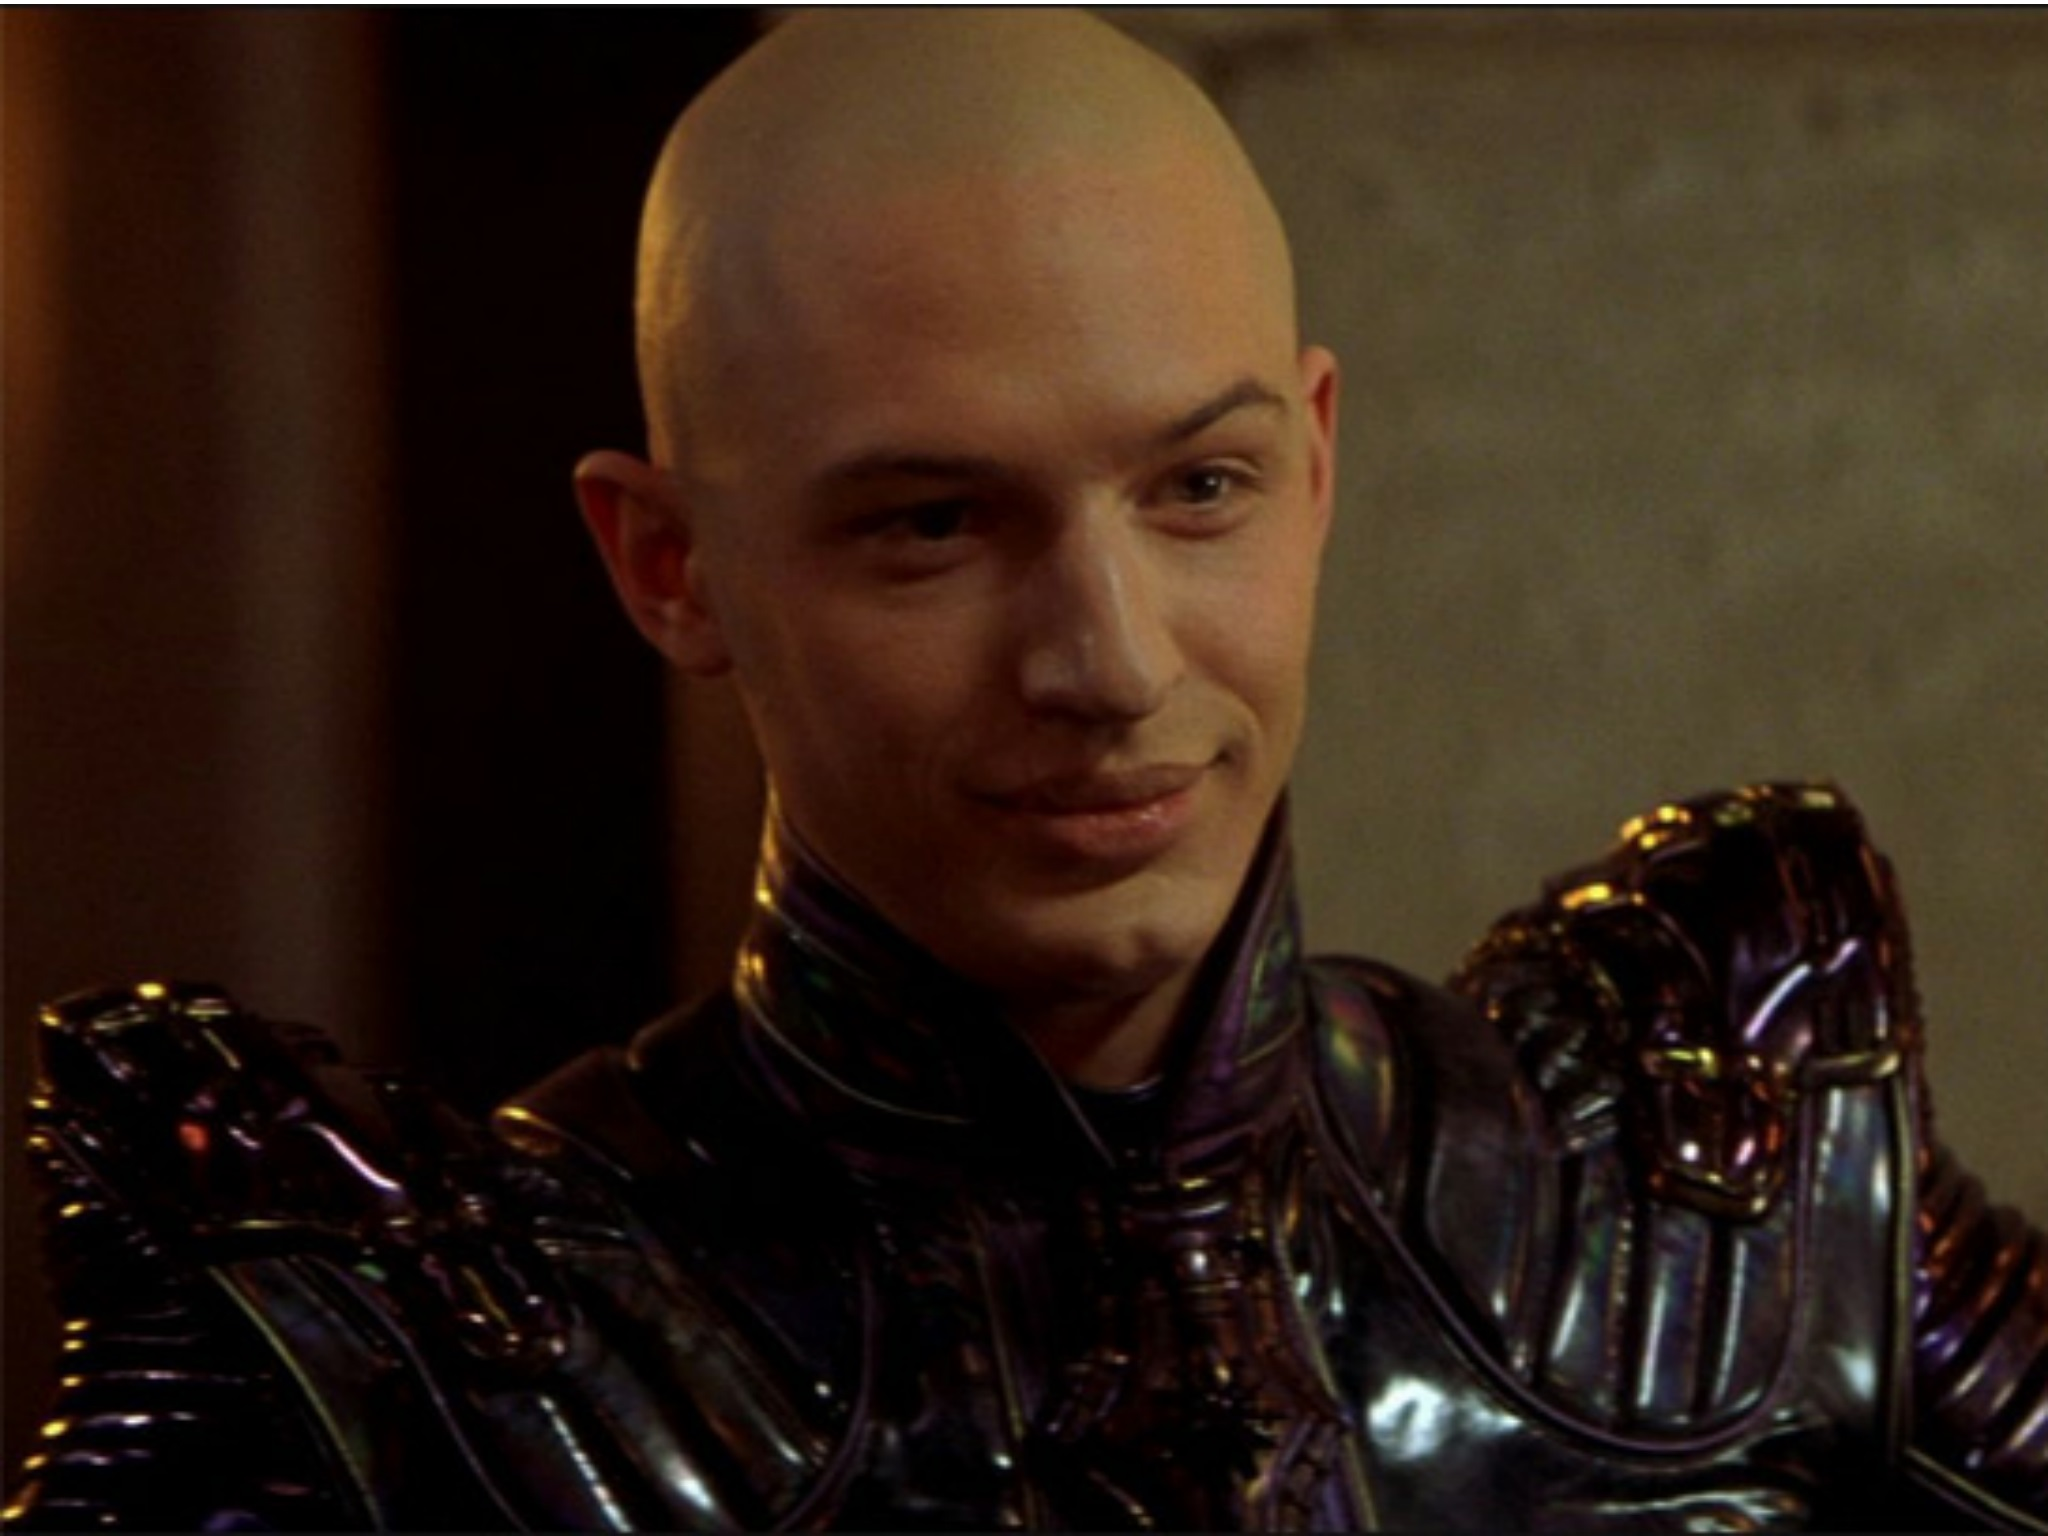 Romulan bad guy Shinzon (Tom Hardy) in Star Trek: Nemesis (2002)